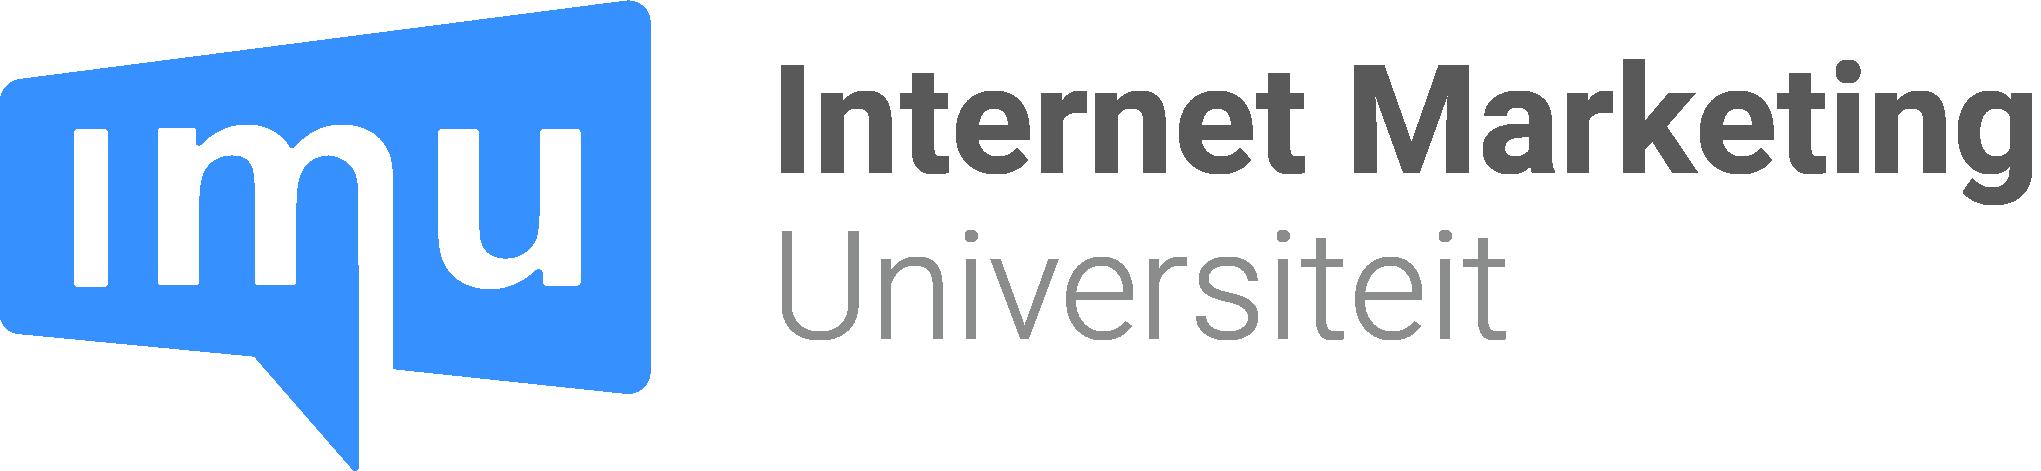 Internet Marketing Universiteit